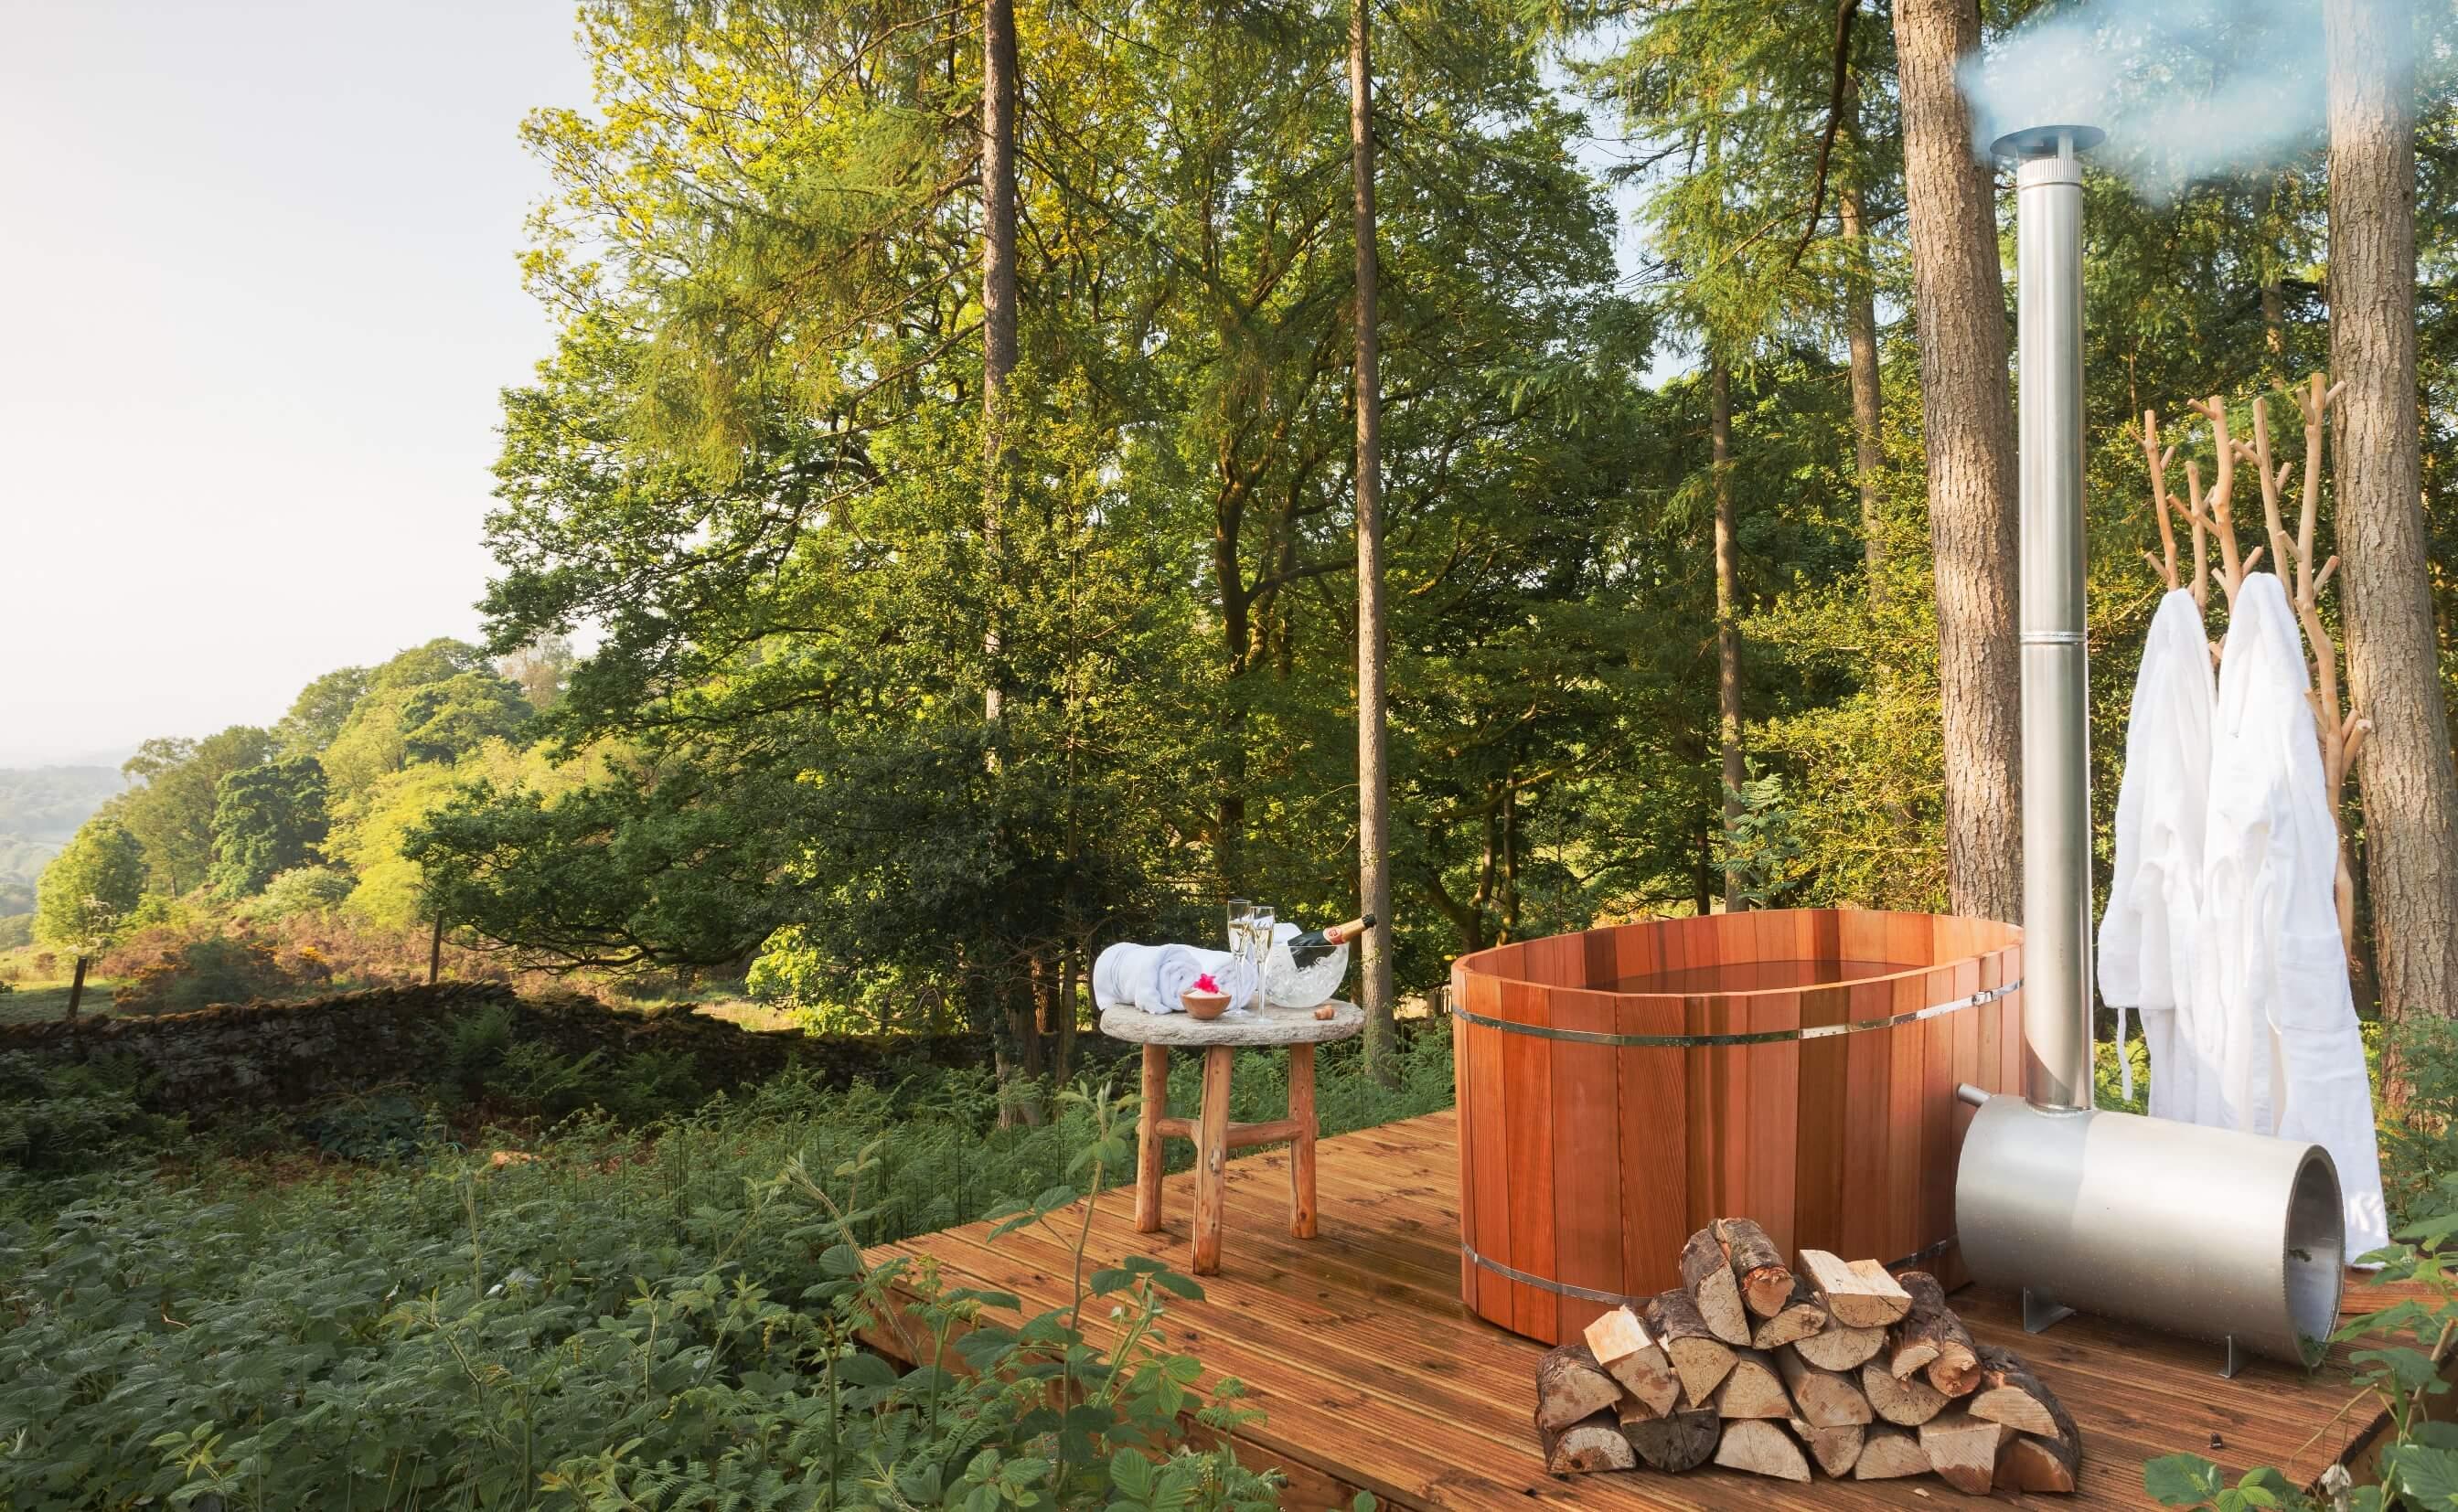 Jetty Spa at Gilpin Hotel Lake House Outdoor Hot Tub